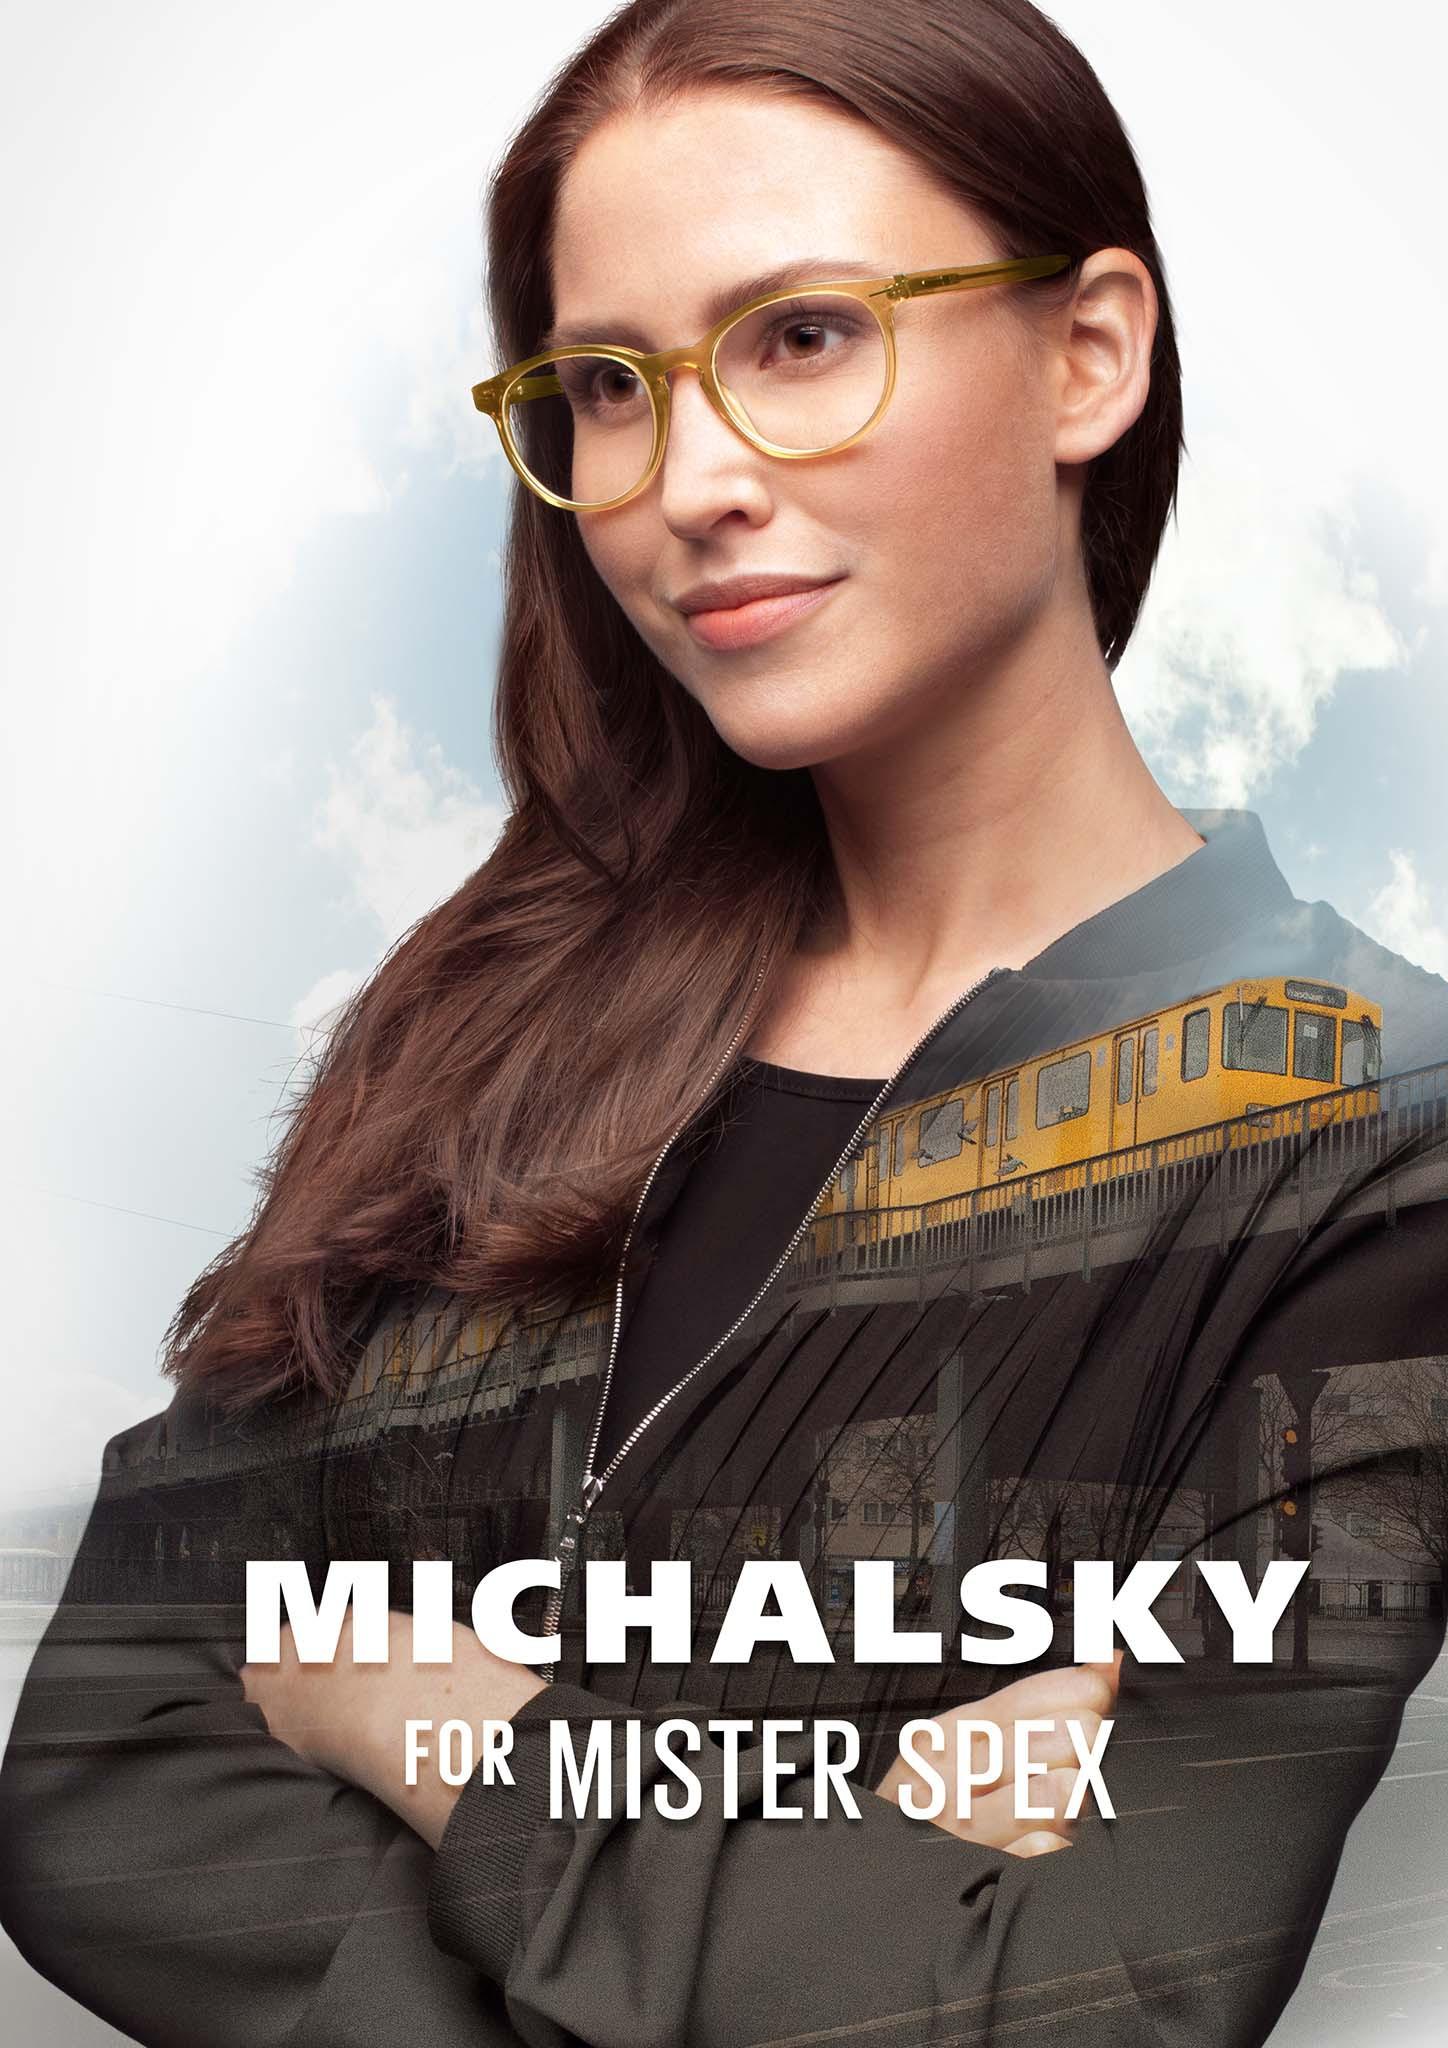 Michalsky for Mister Spex // Female